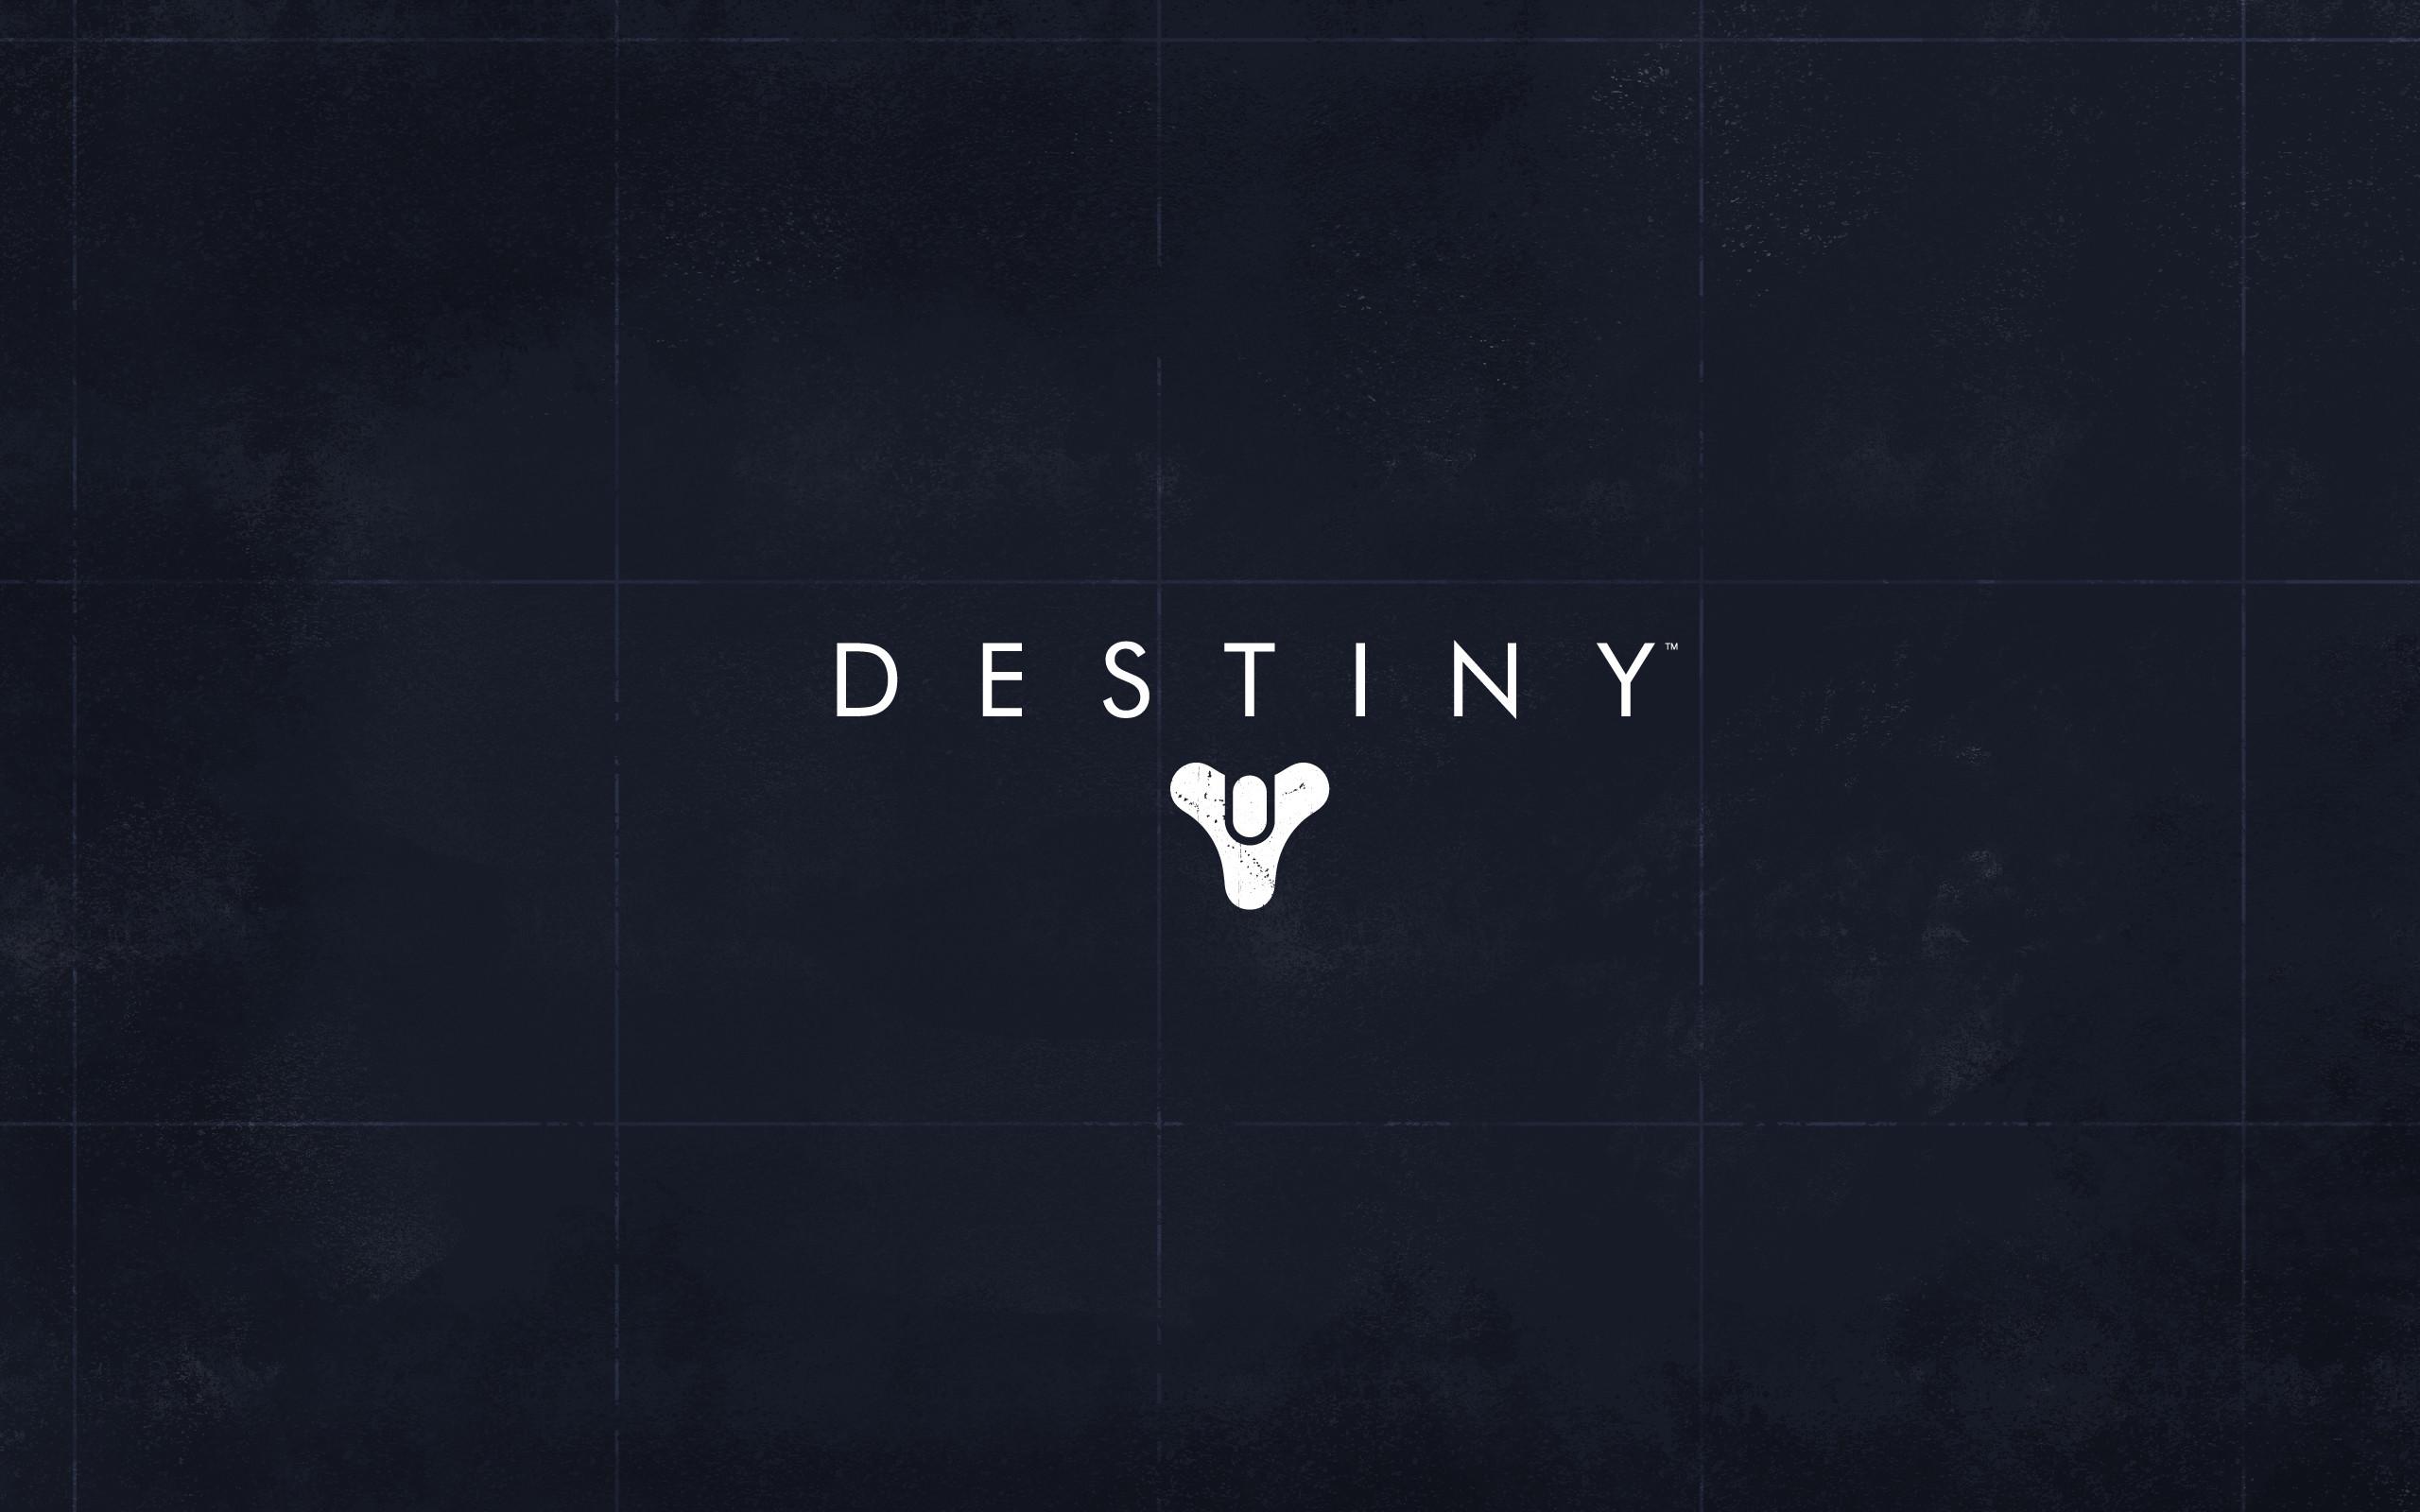 Emblem Wallpaper Destinyblog   News Community 2560x1600